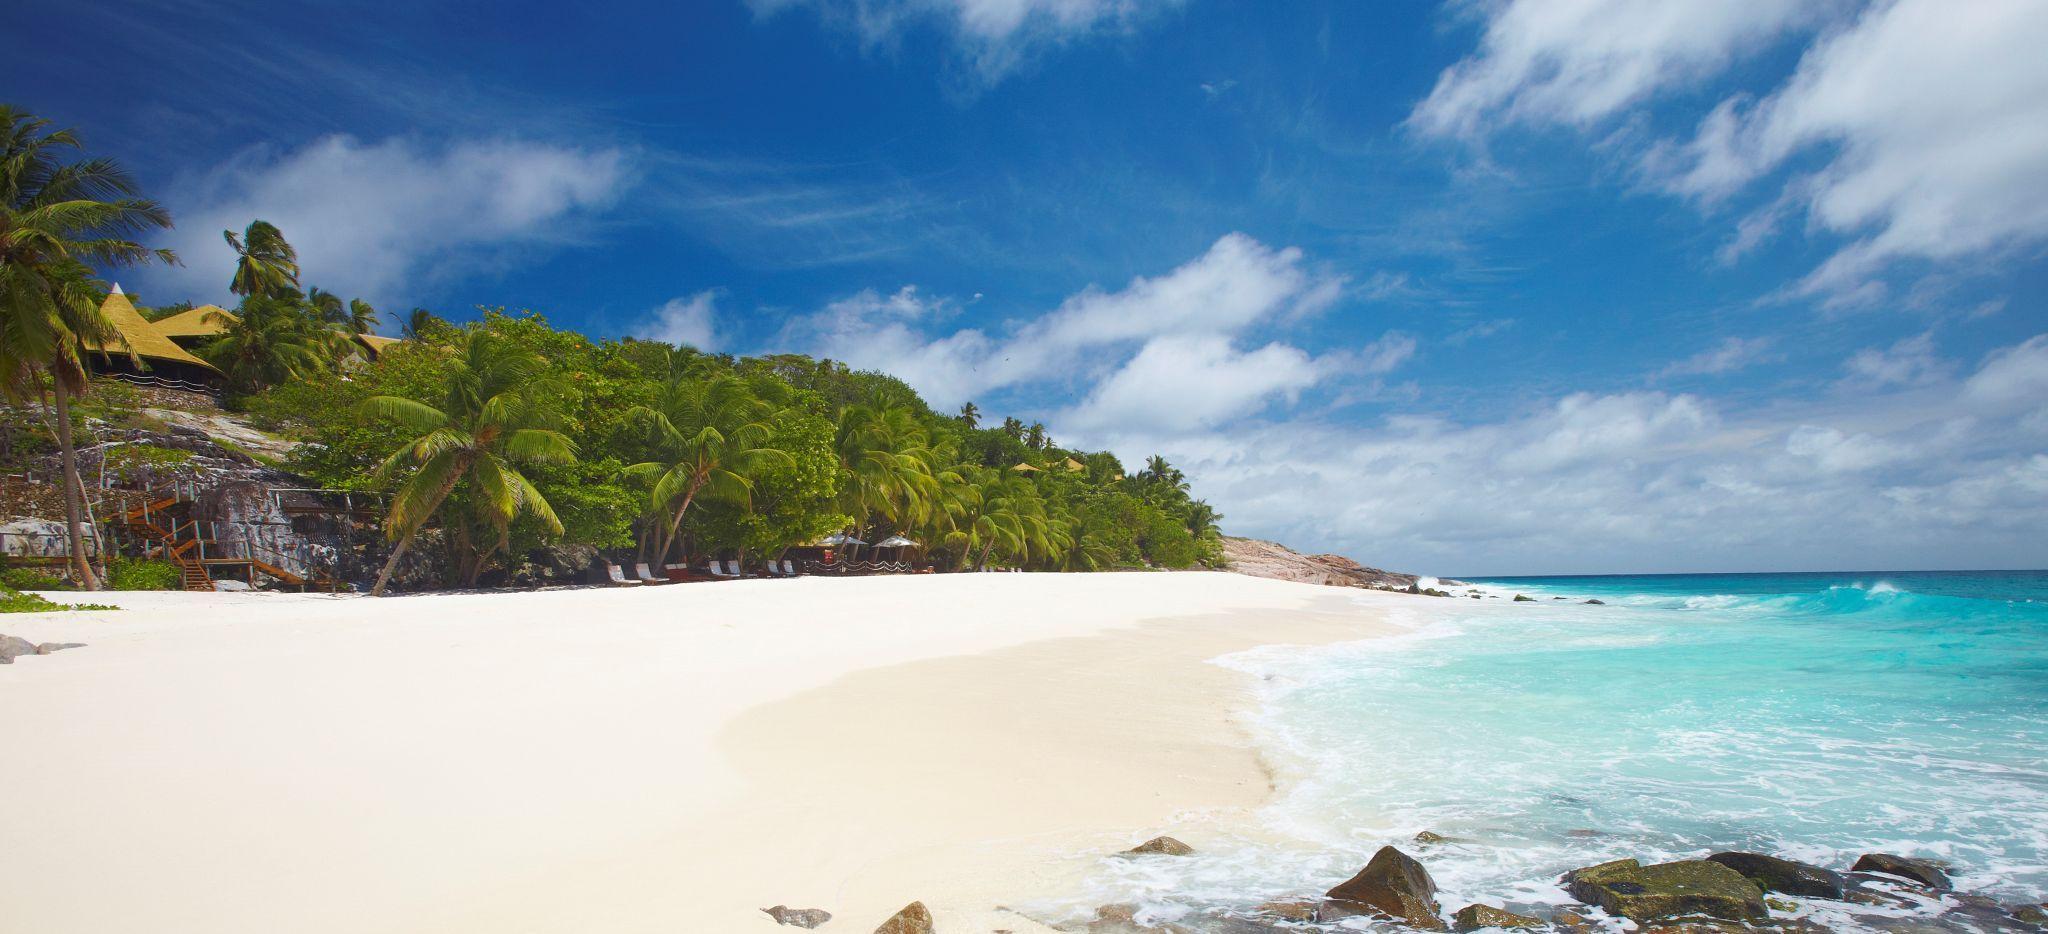 Der Strand Anse Bamboo auf Frégate Island, Seychellen